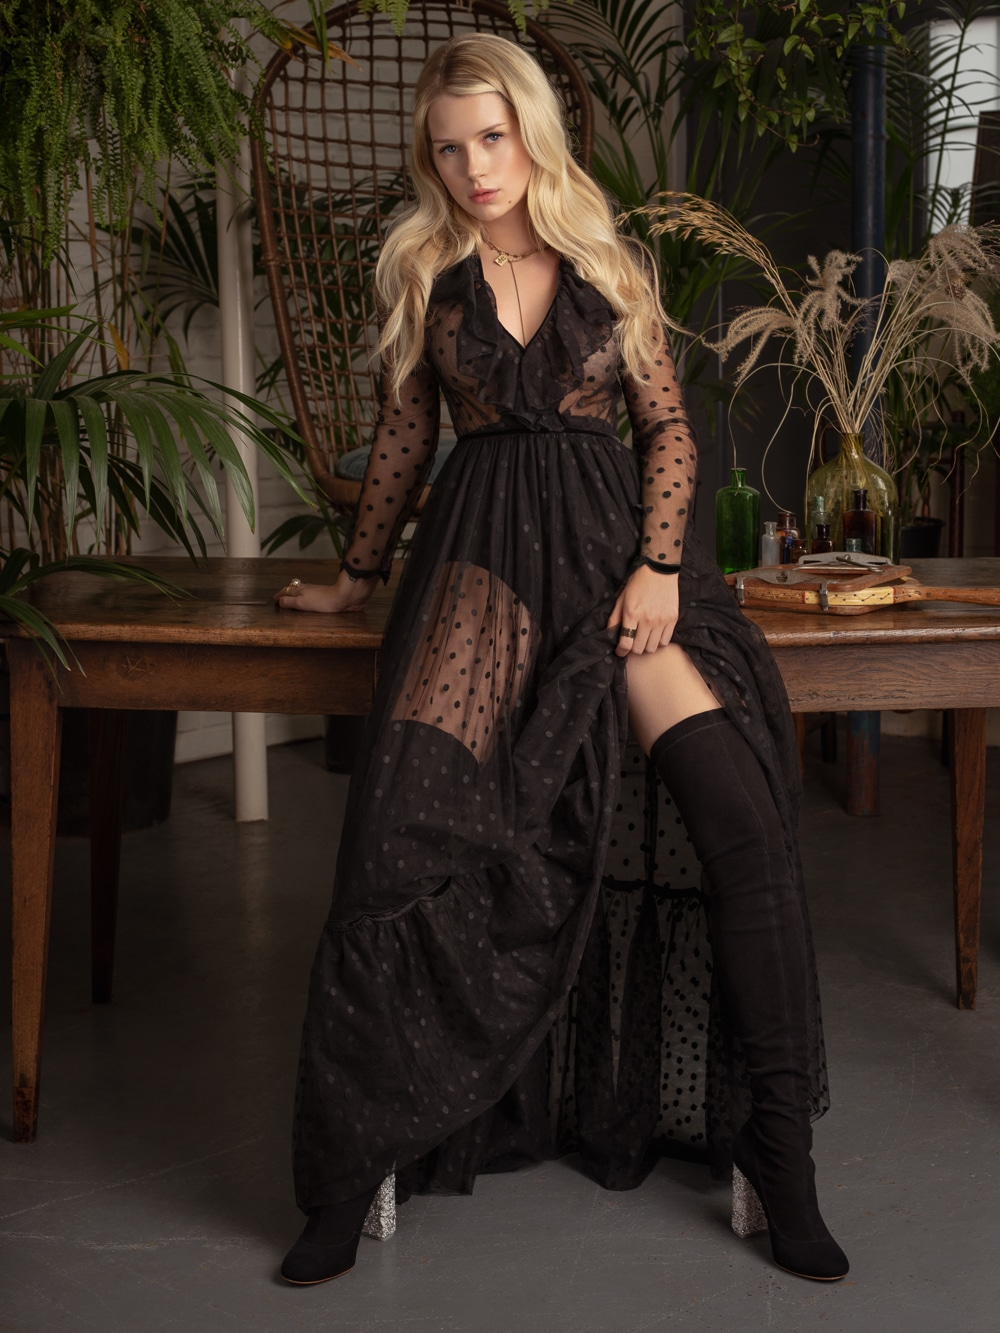 Lottie Moss by Anna Zesiger for Elle Bulgaria October 2018